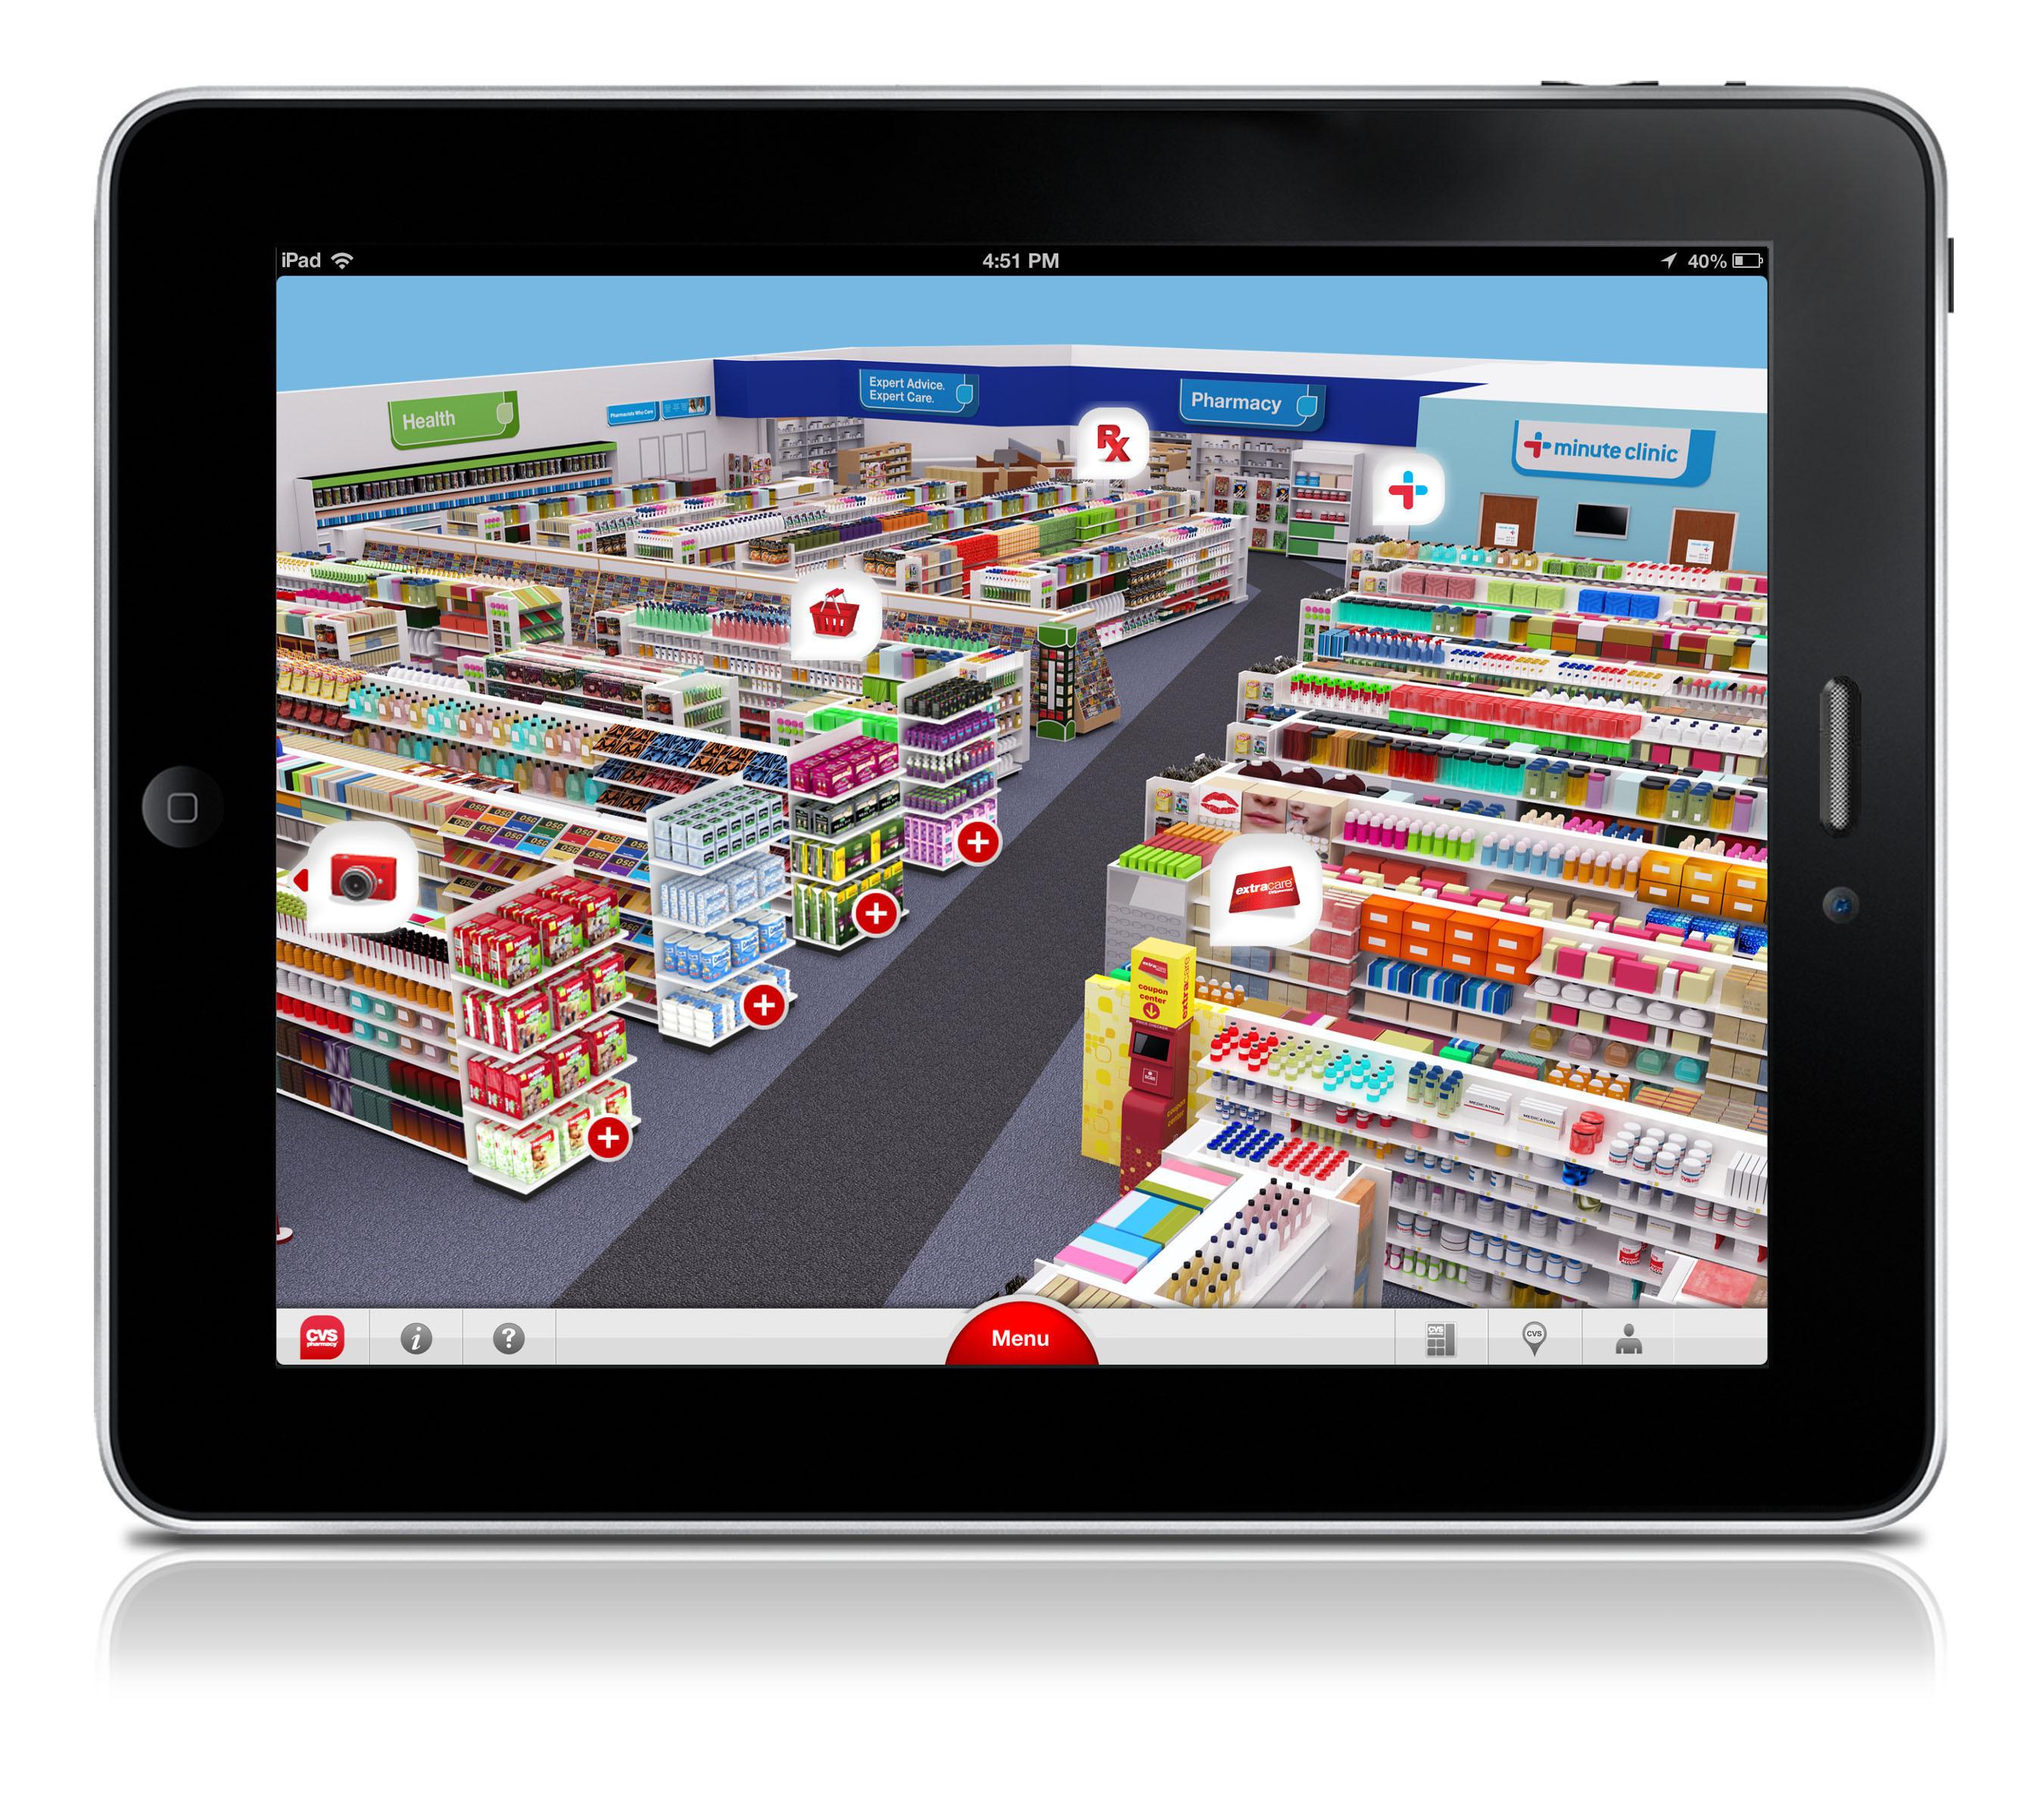 cvs launches virtual pharmacy app for ipads